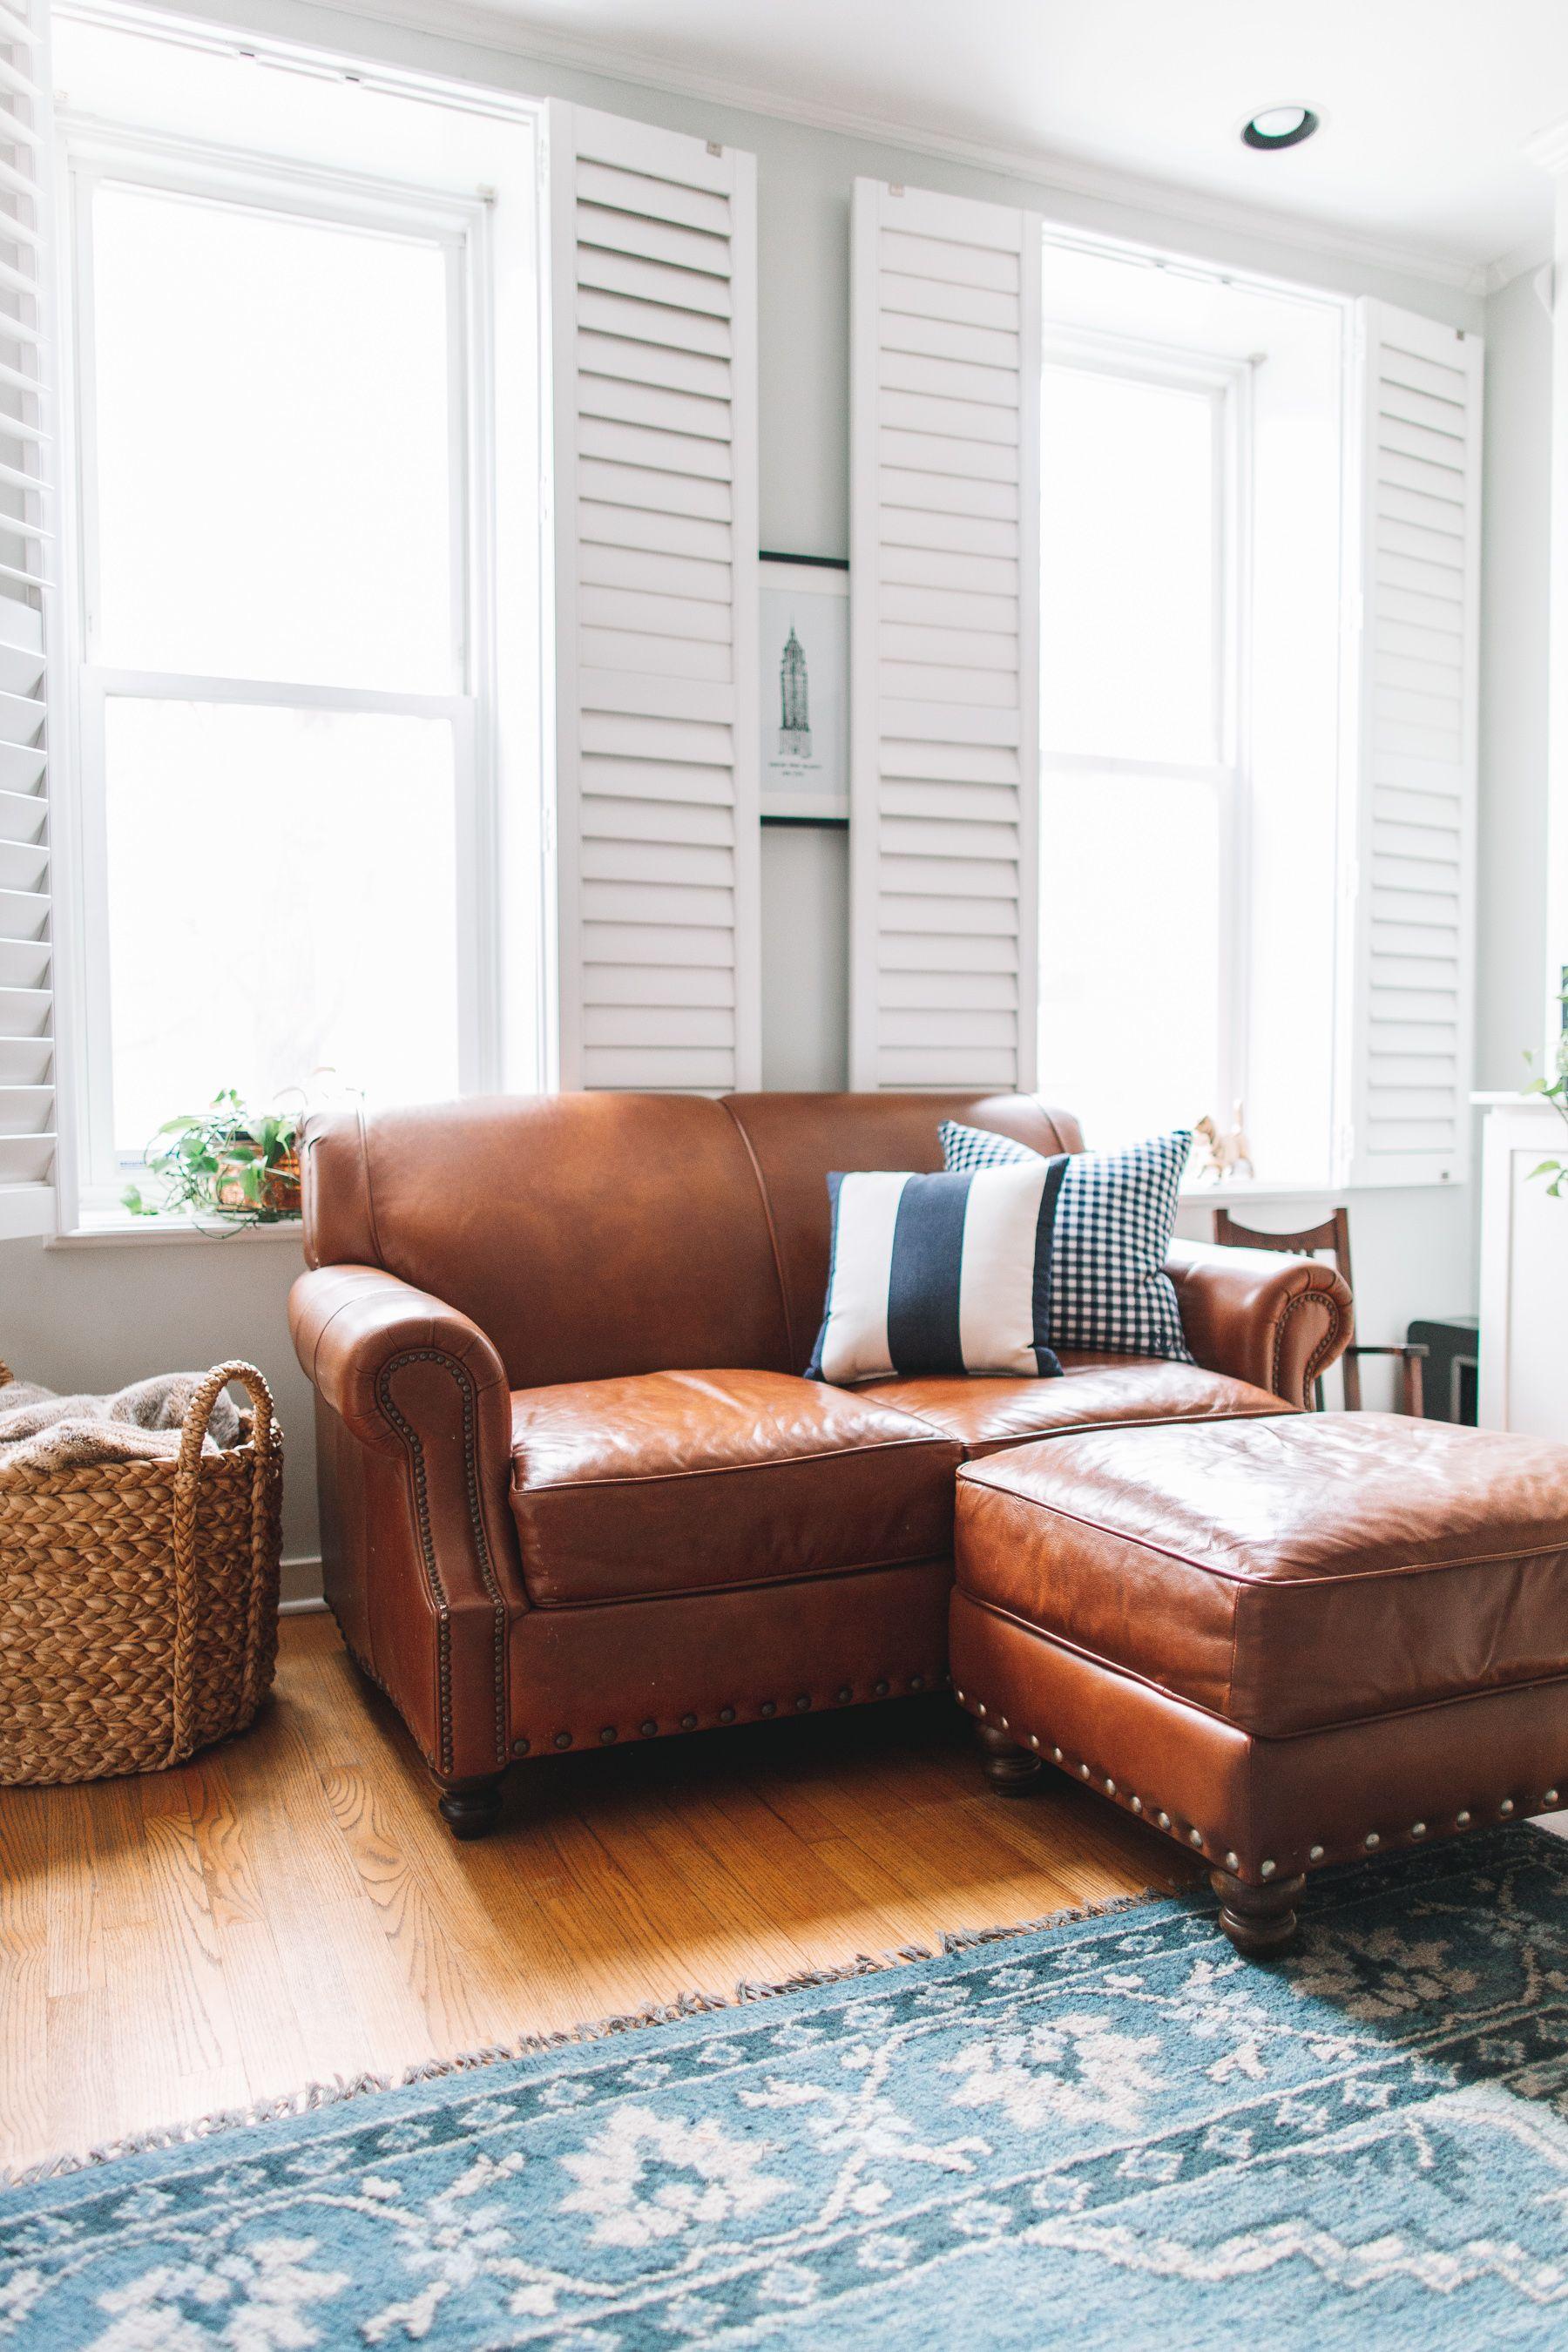 Birch Lane Landry Leather Sofa Review Leather sofa